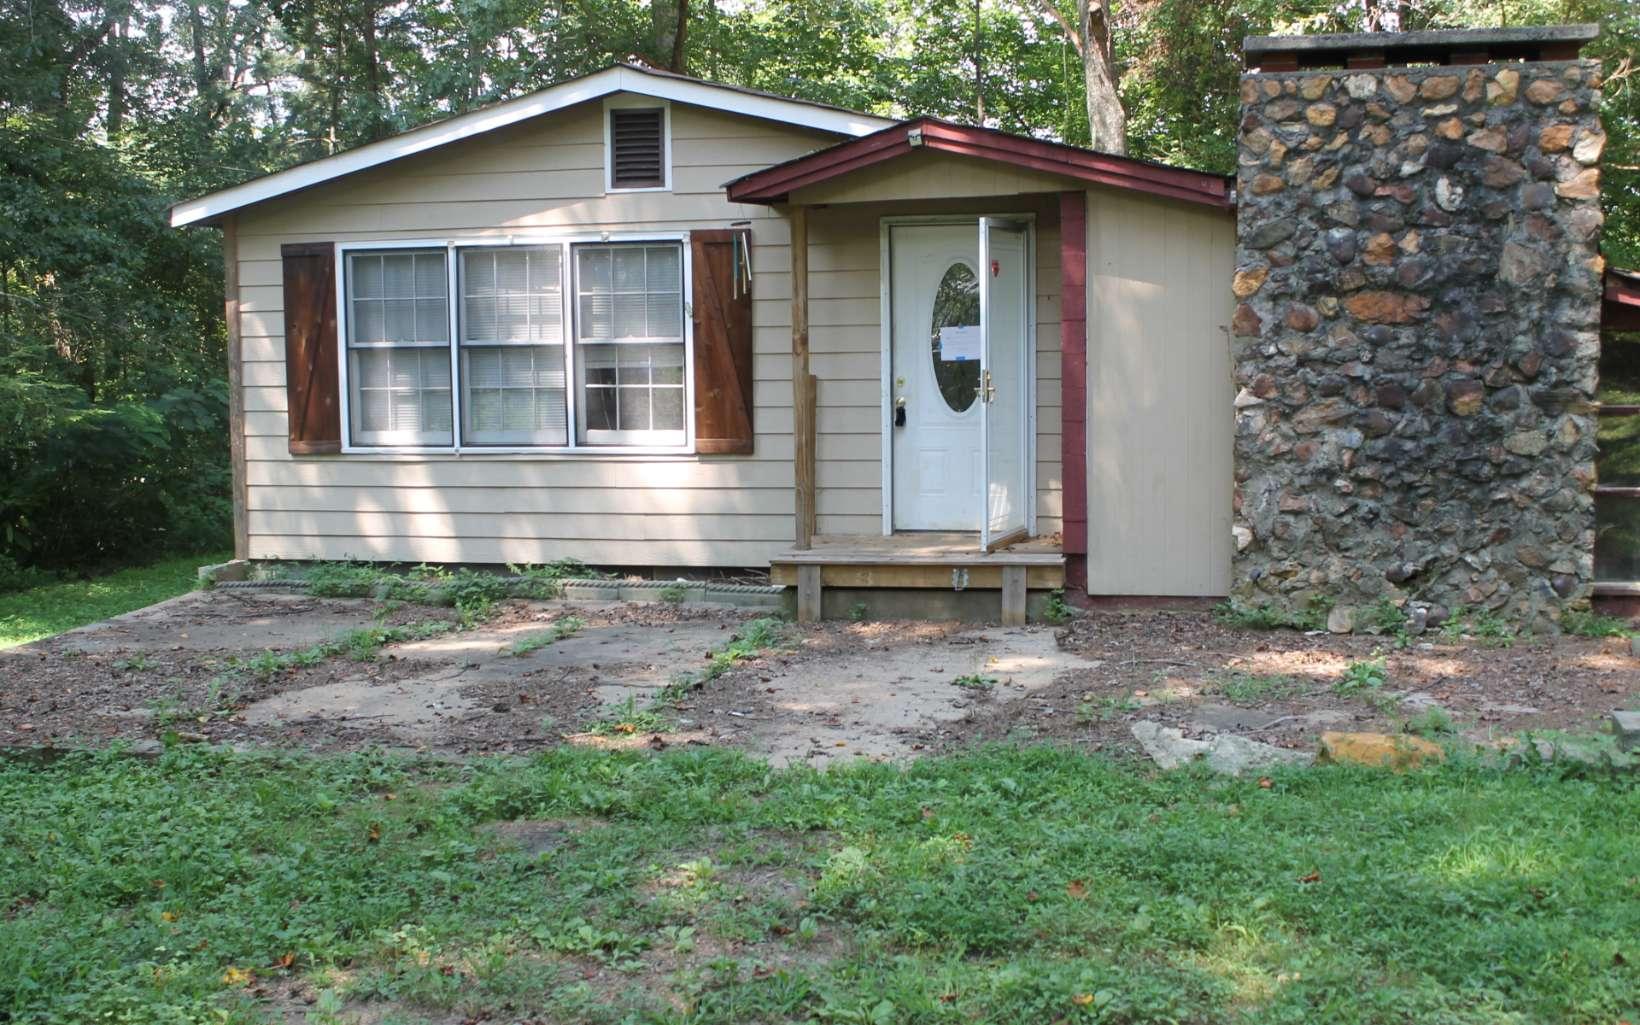 North Georgia Mountain Foreclosure Cabins/Homes